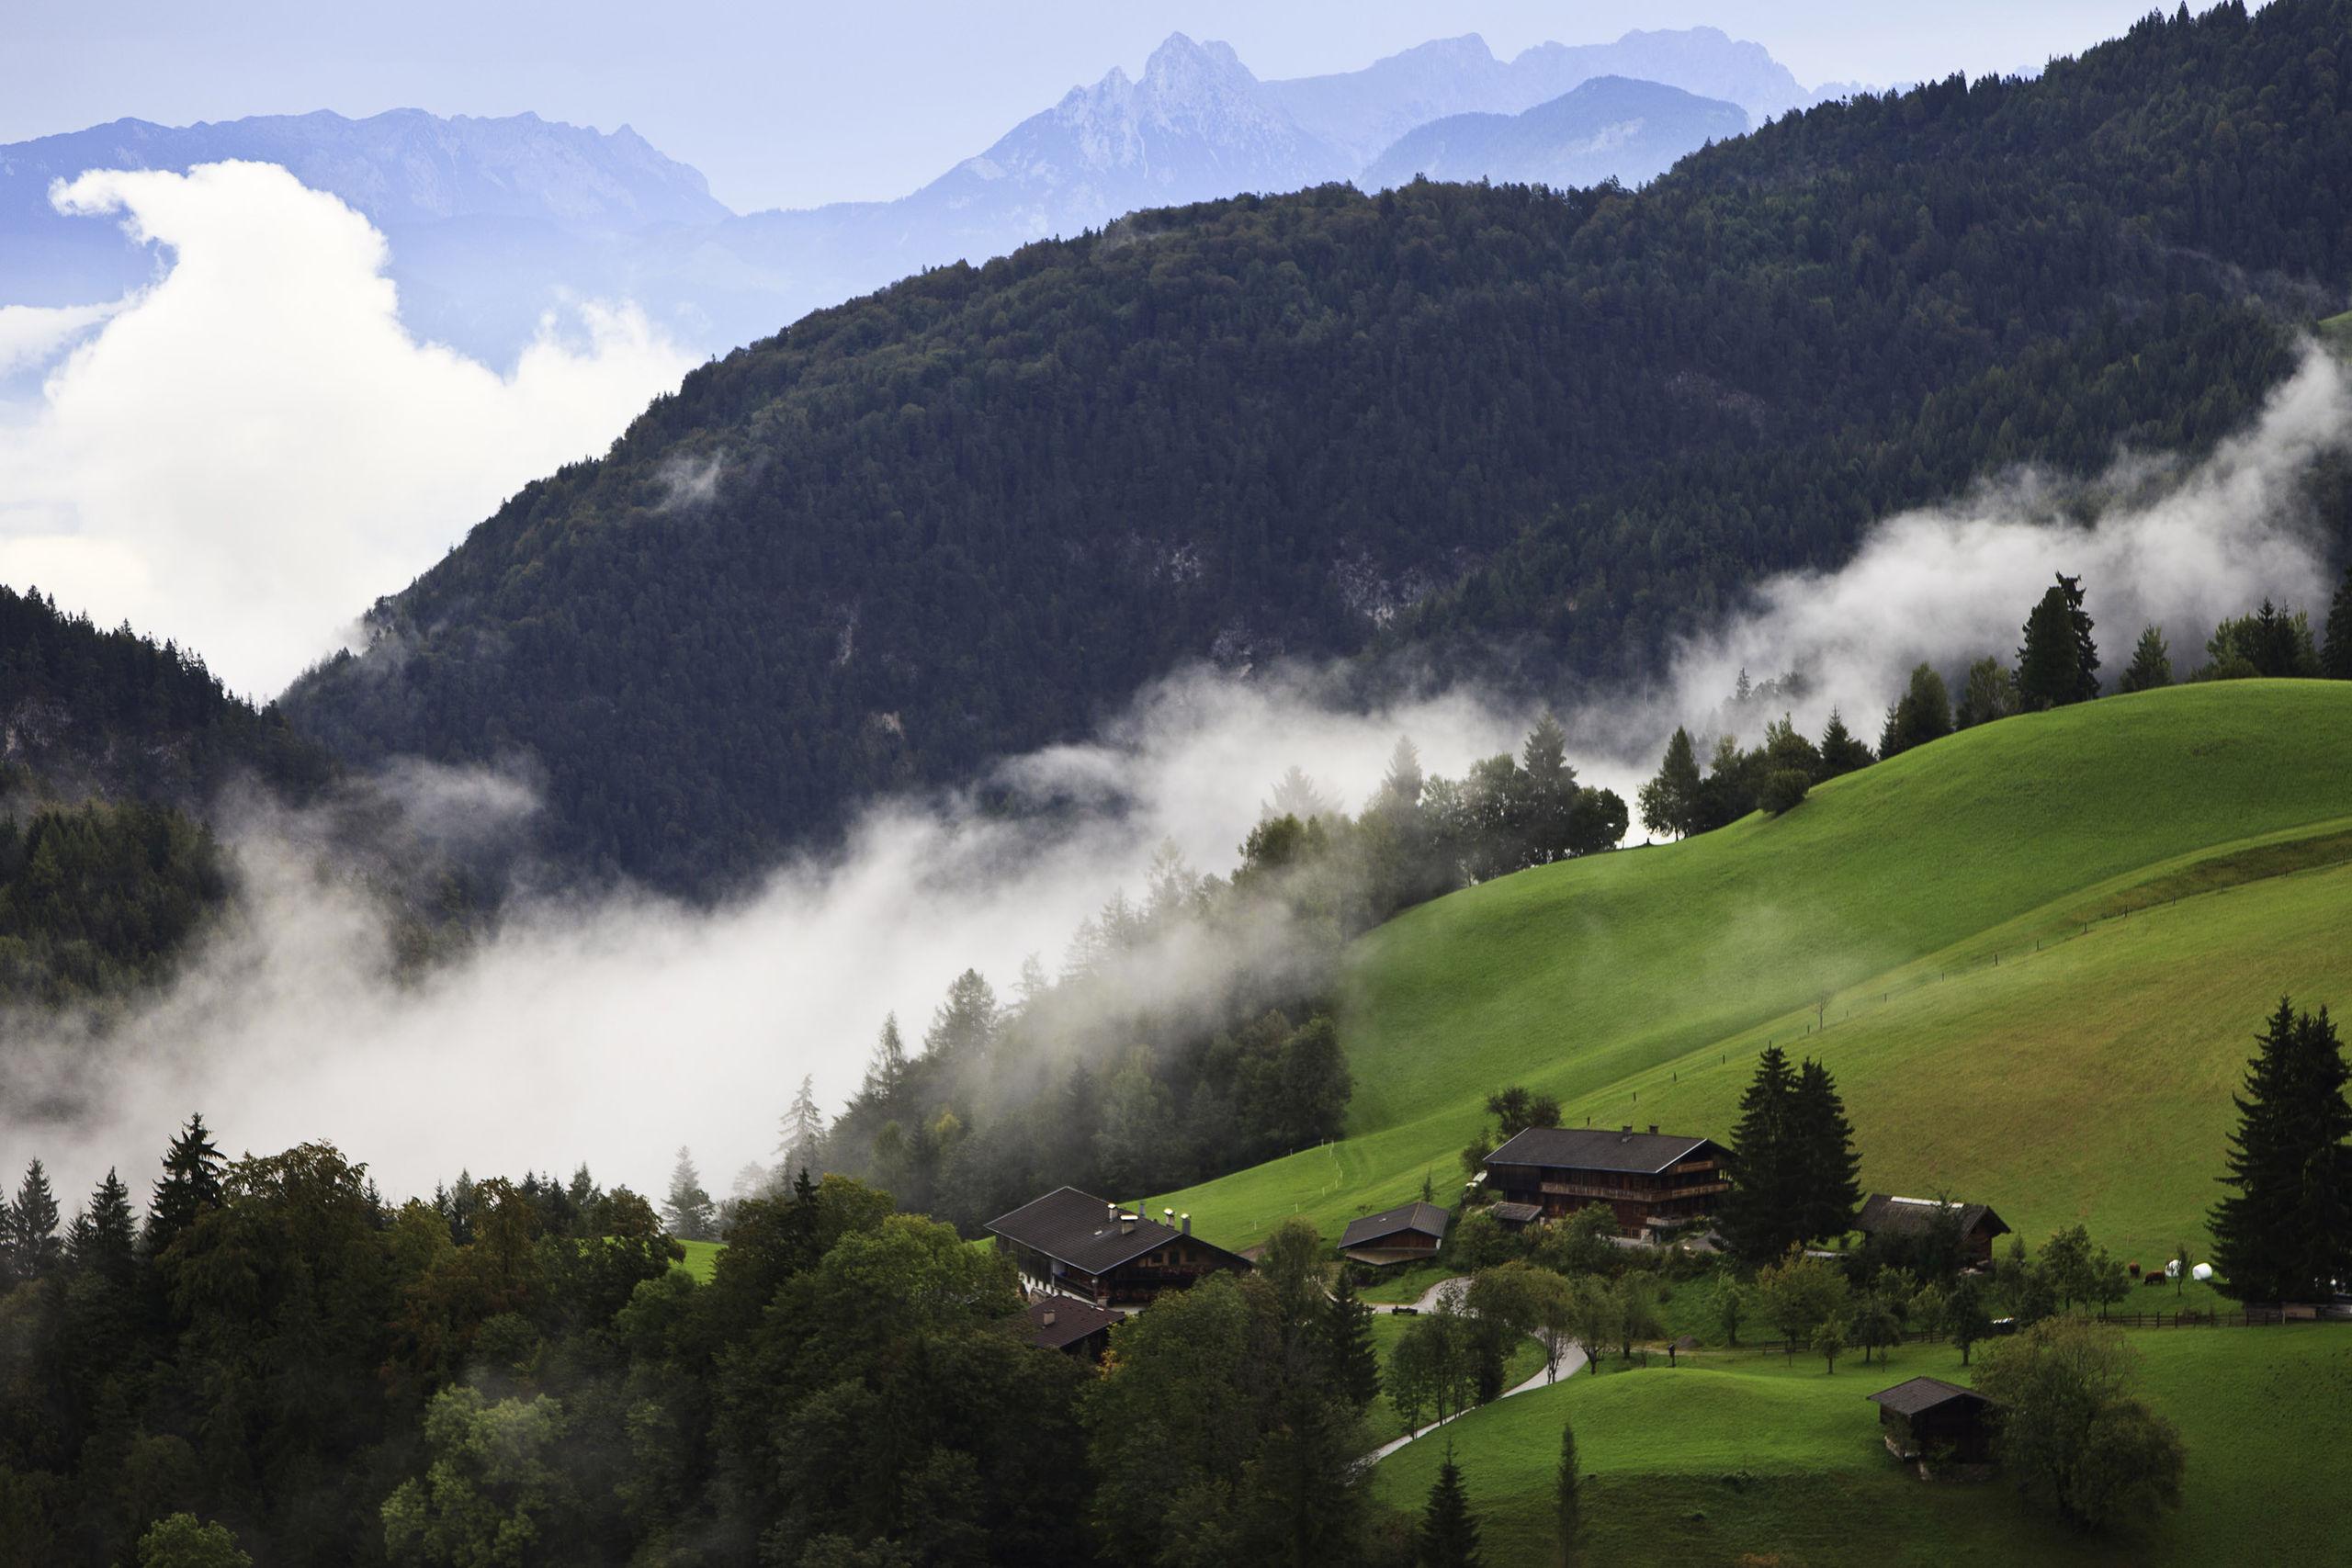 Aktivurlaub Alpbachtal Tirol Werbung Sandbichler Peter